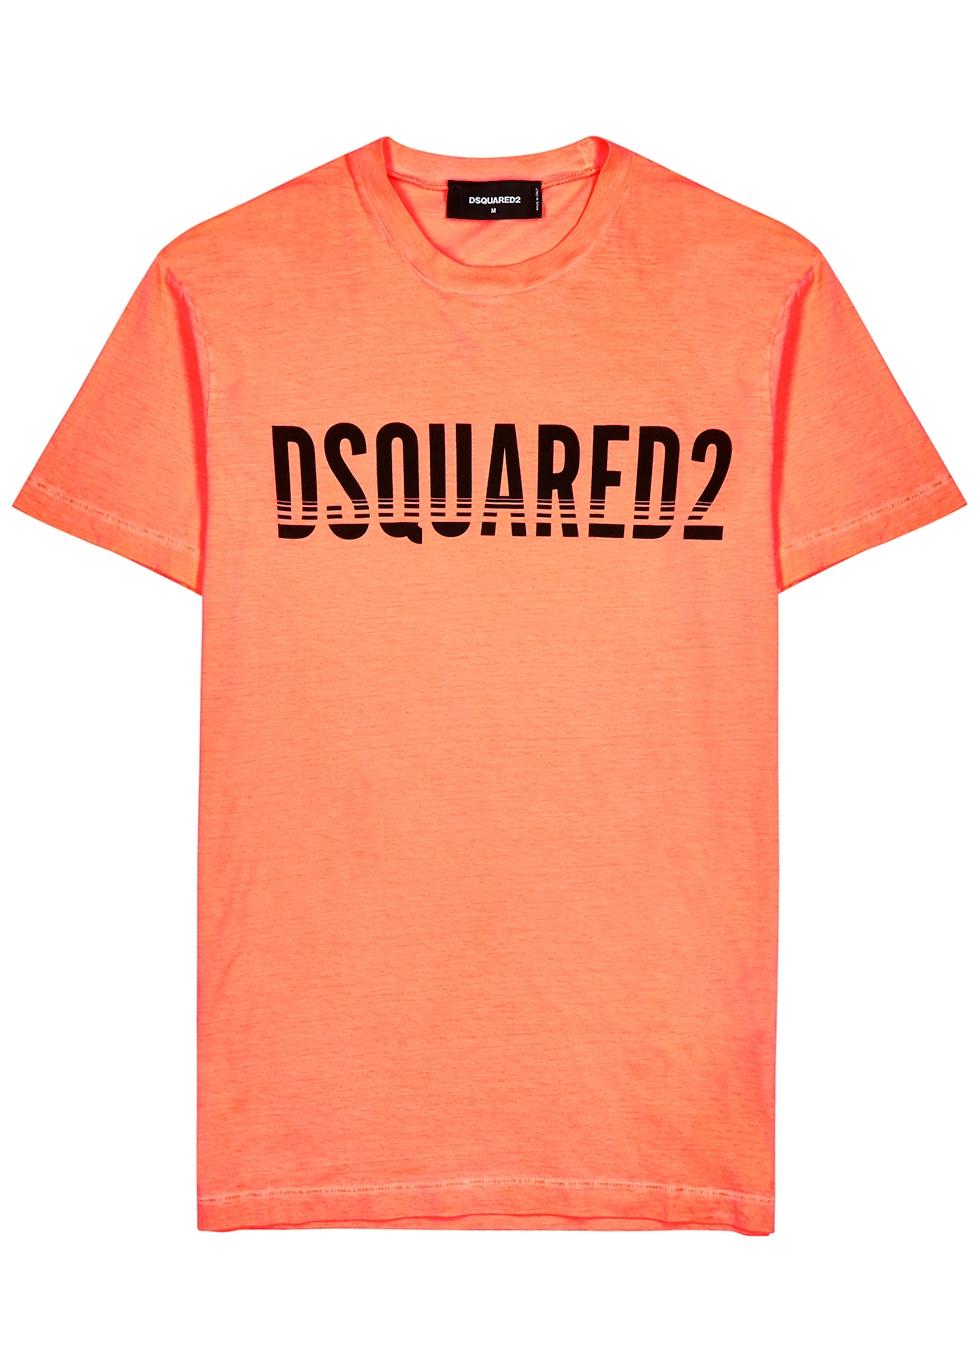 def0b6cc T-shirts & Vests - Harvey Nichols